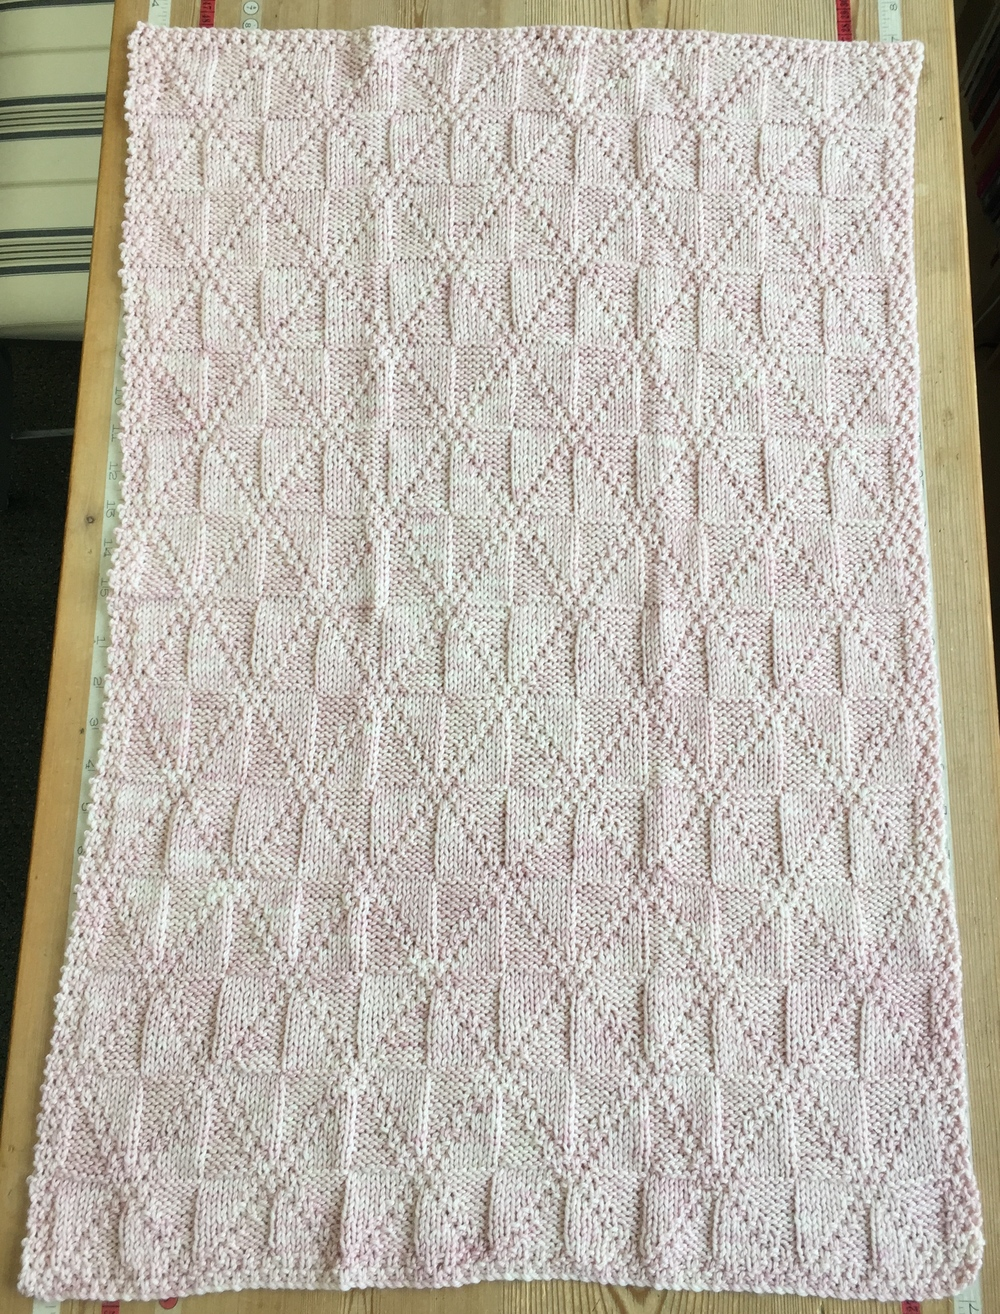 The STELLA pinwheel blanket in Miss Babs YOWZA ... one skein ... spun sugar deliciousness!